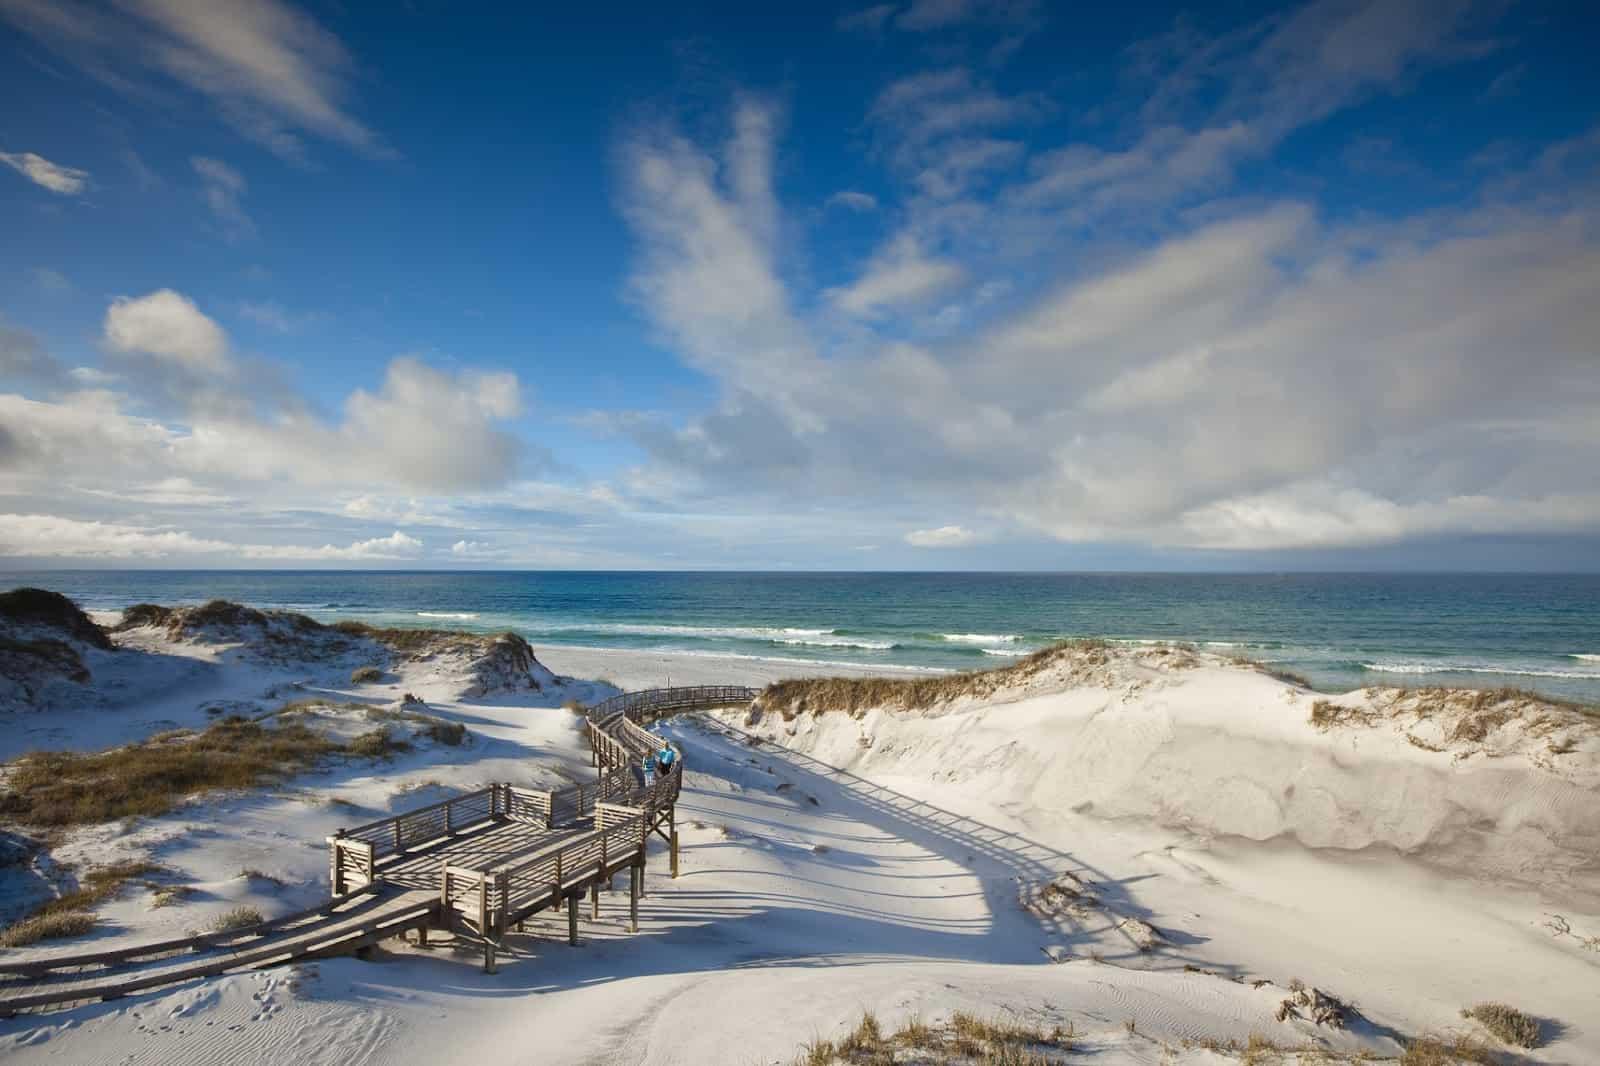 Santa Rosa Beach, Santa Rosa Florida, Emerald Coast beaches, Santa Rosa beaches